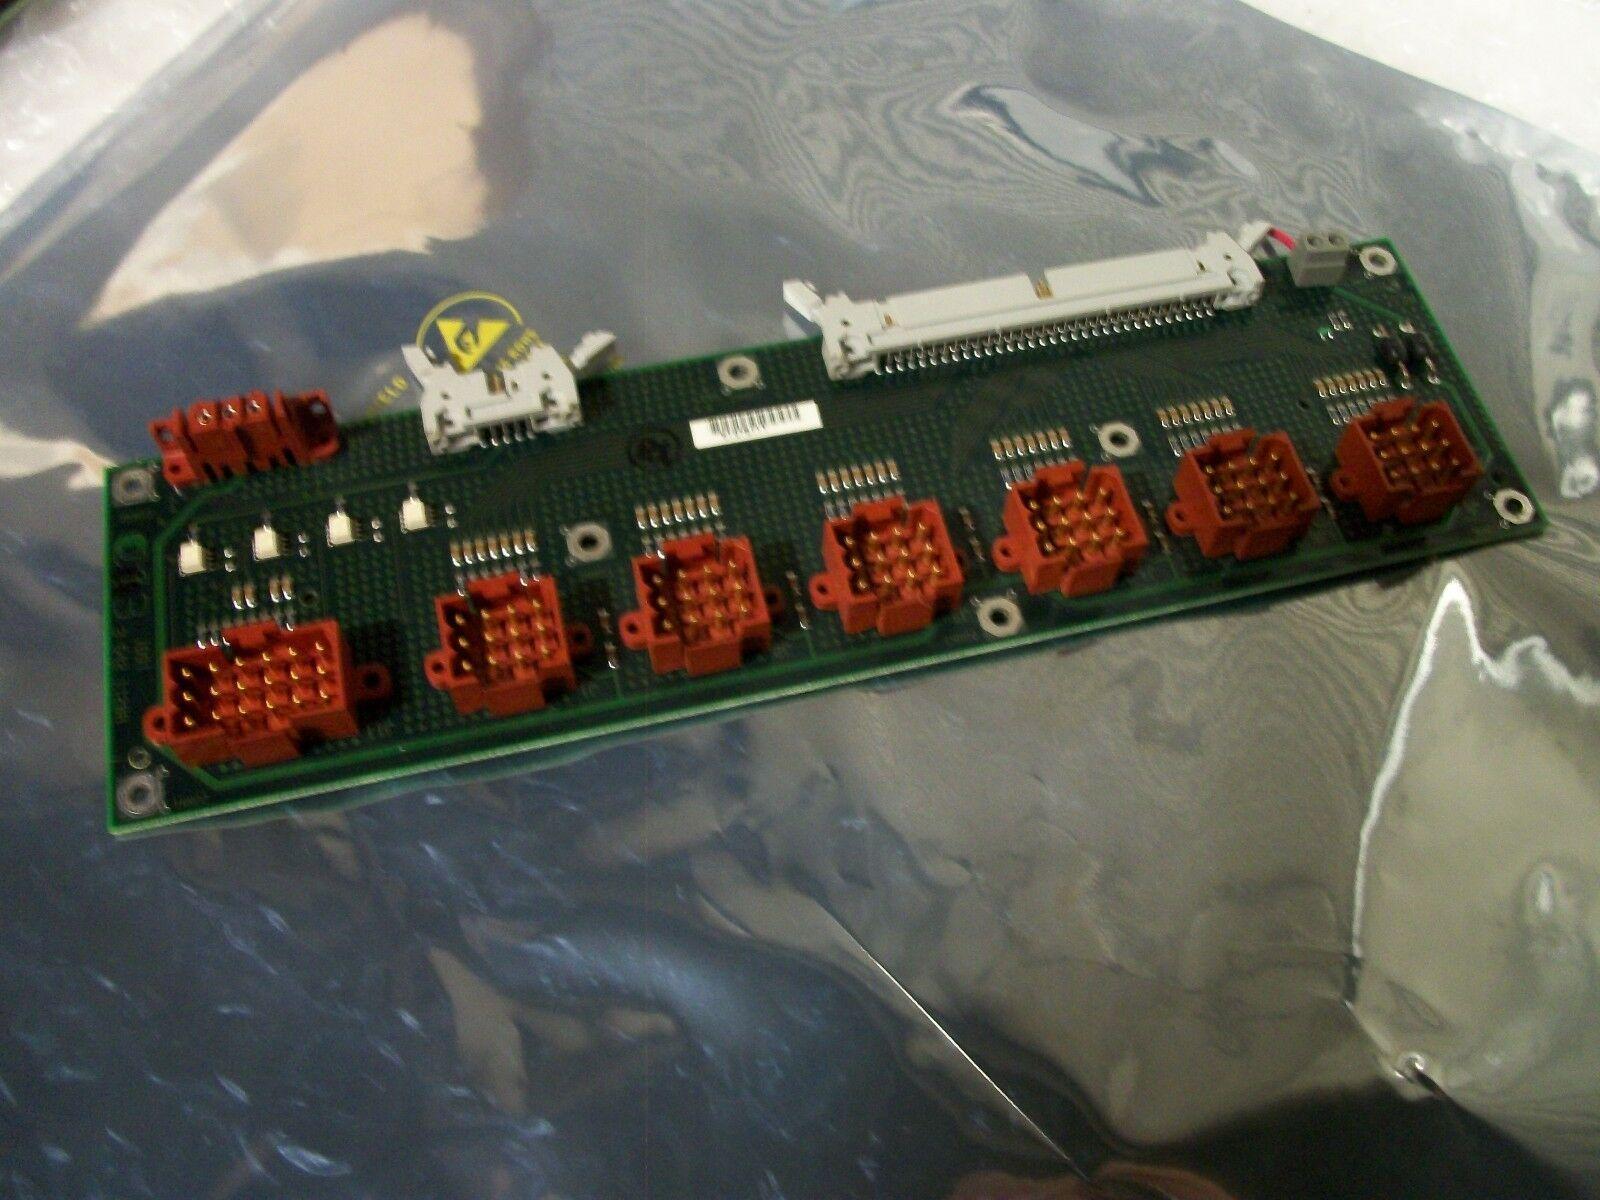 Cincinnati Milacron Siemens CNC Control Circuit Board 3-542-1120A